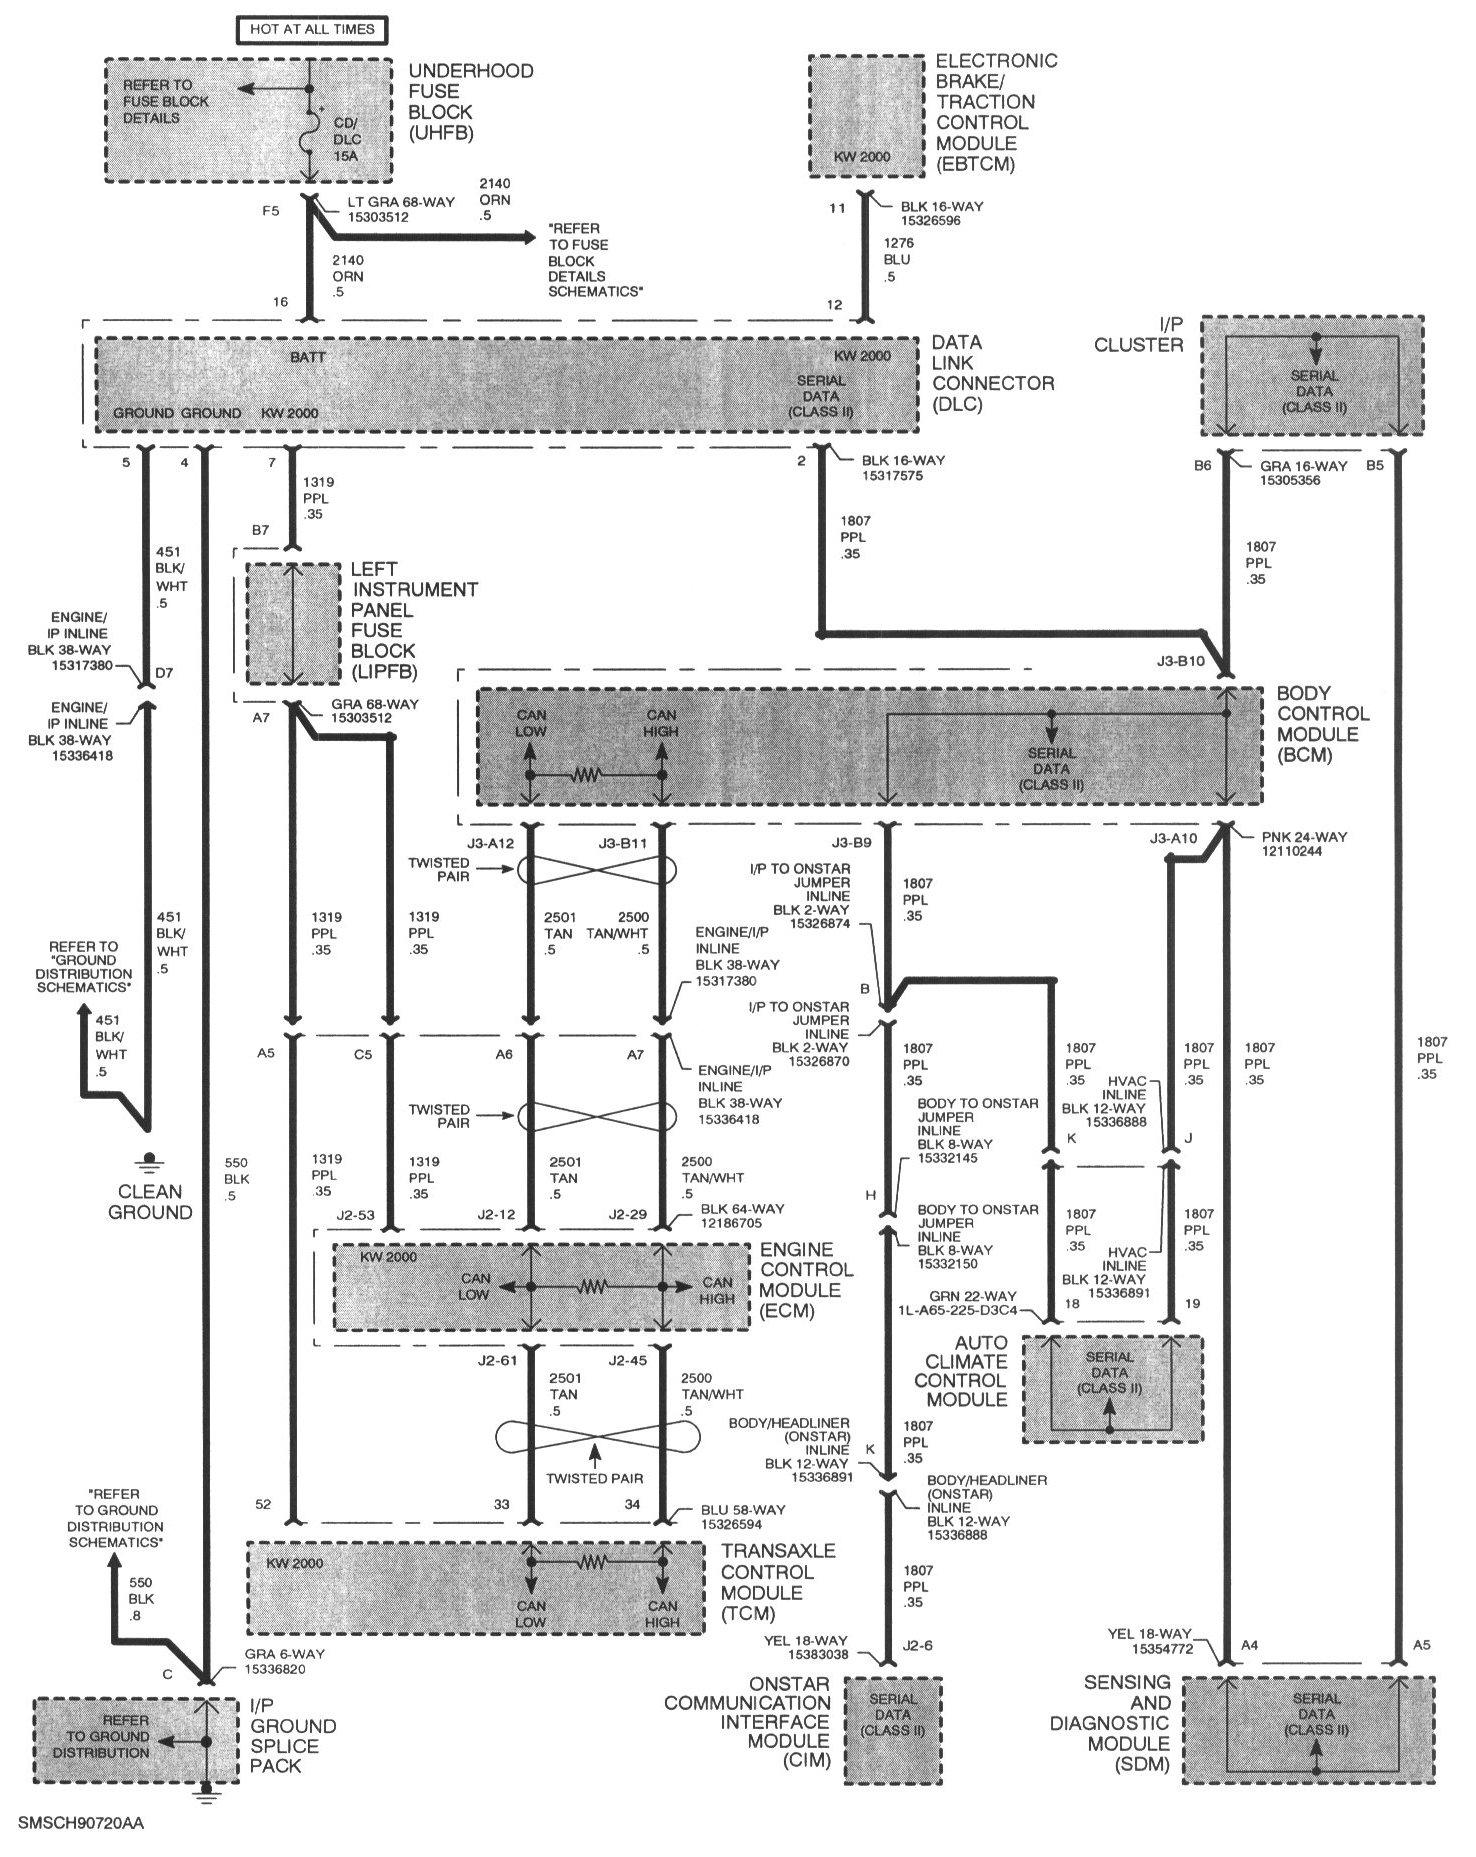 Mitsubishi L200 Warrior Wiring Diagram : Wiring diagram mitsubishi l